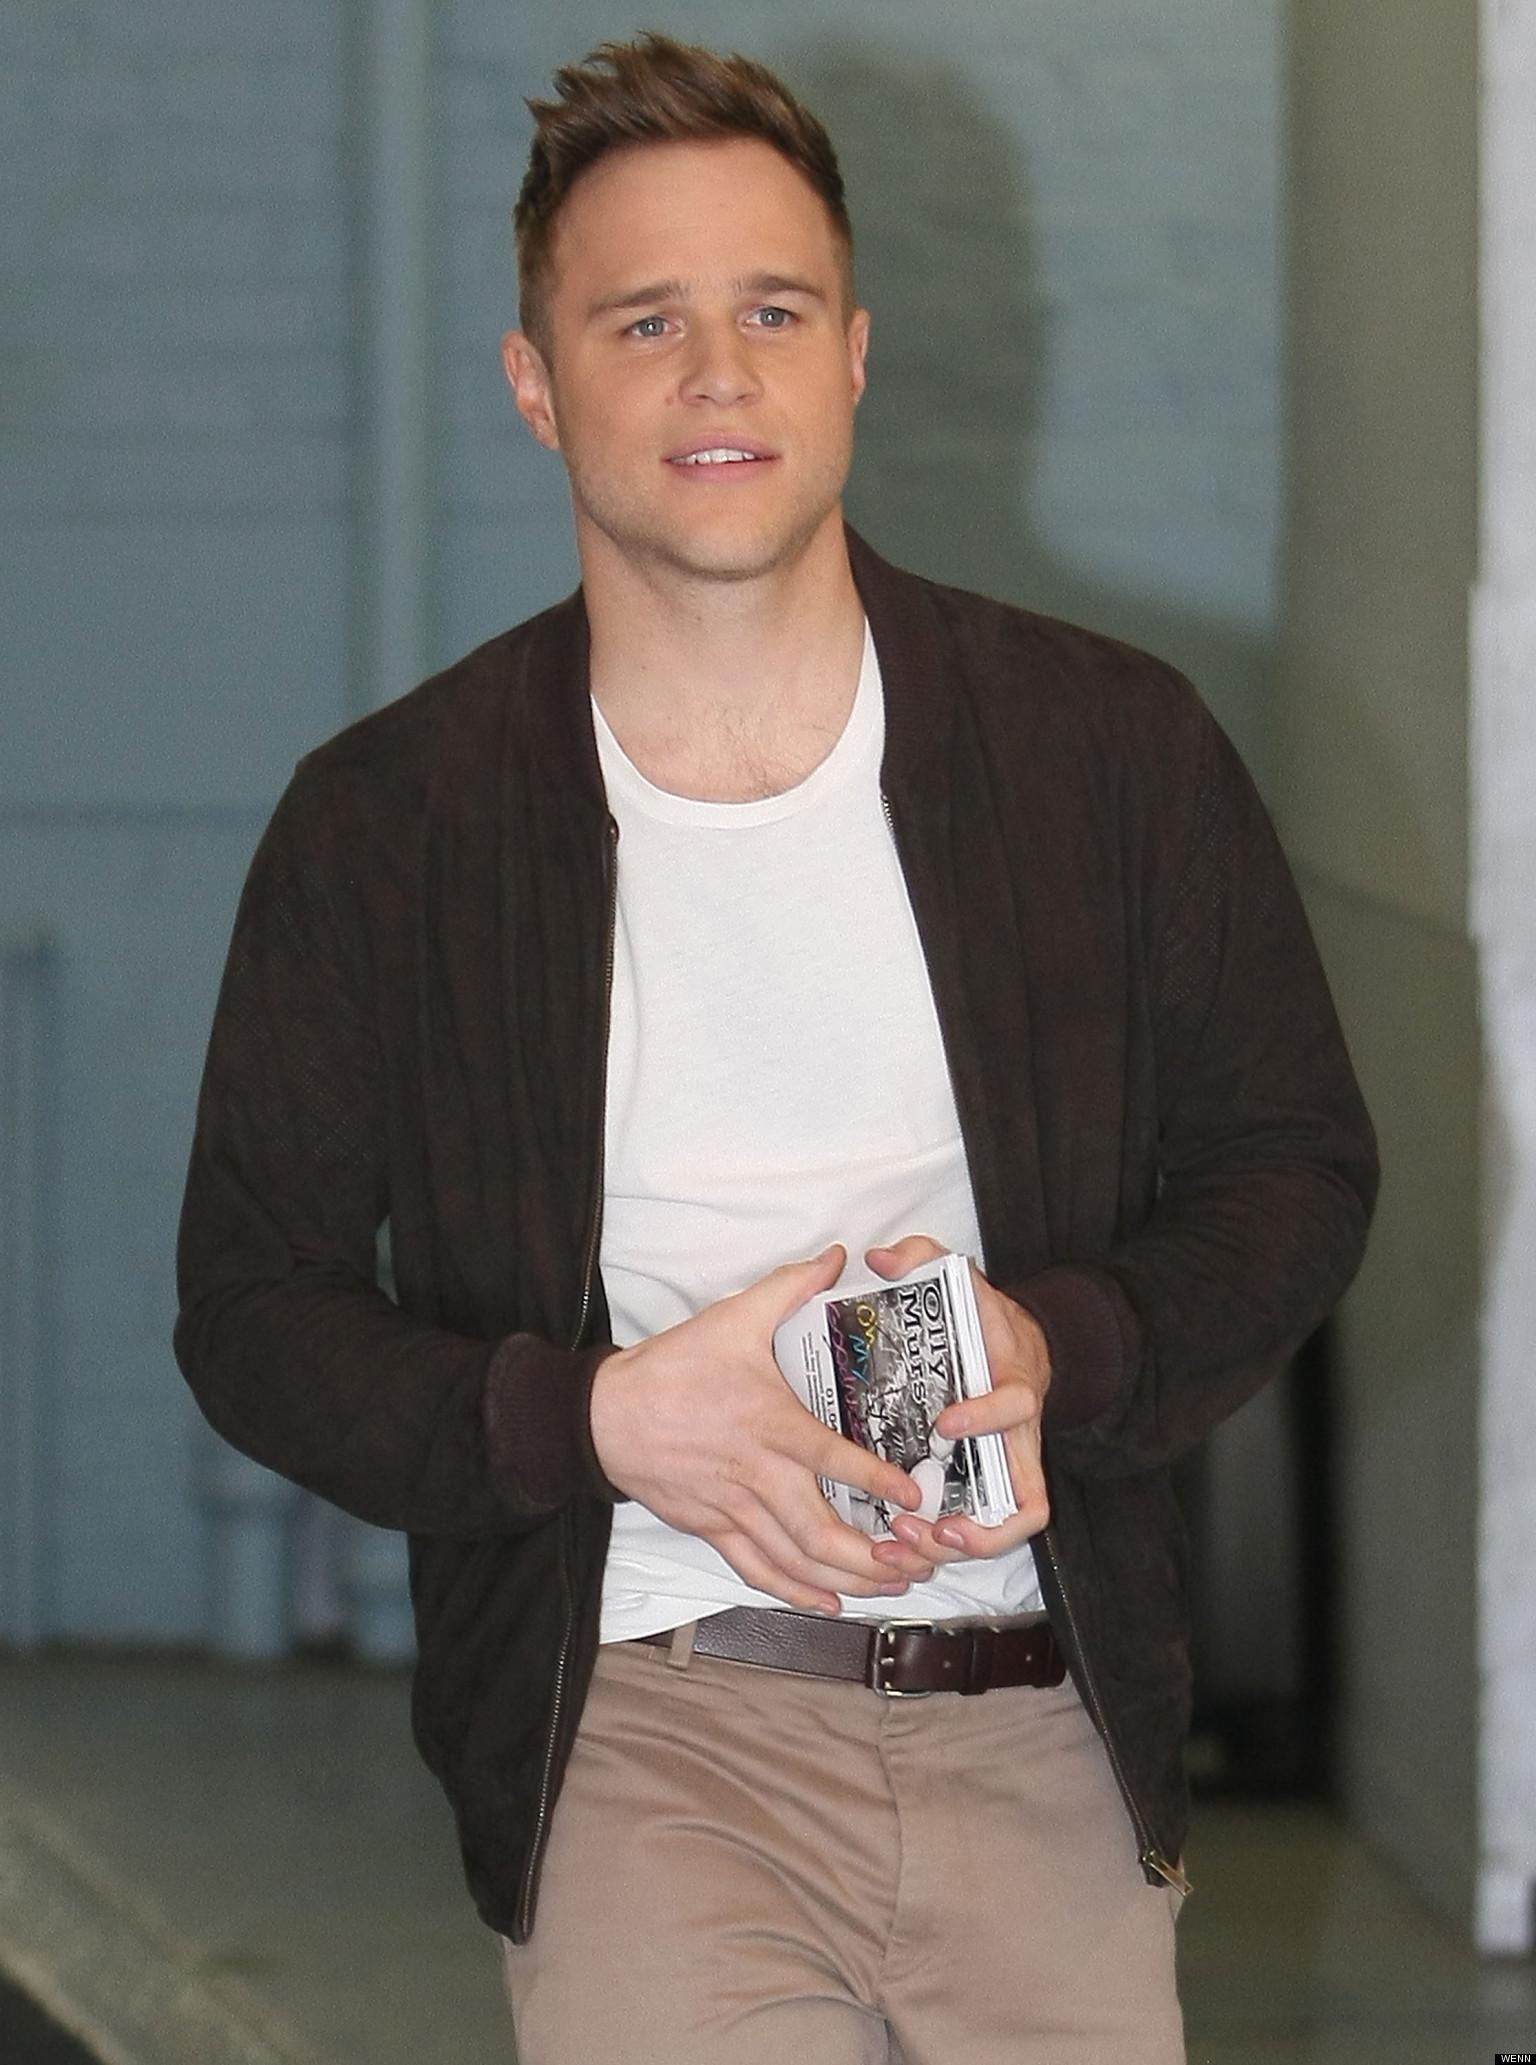 Olly murs black t shirt x factor - Olly Murs Black T Shirt X Factor 52